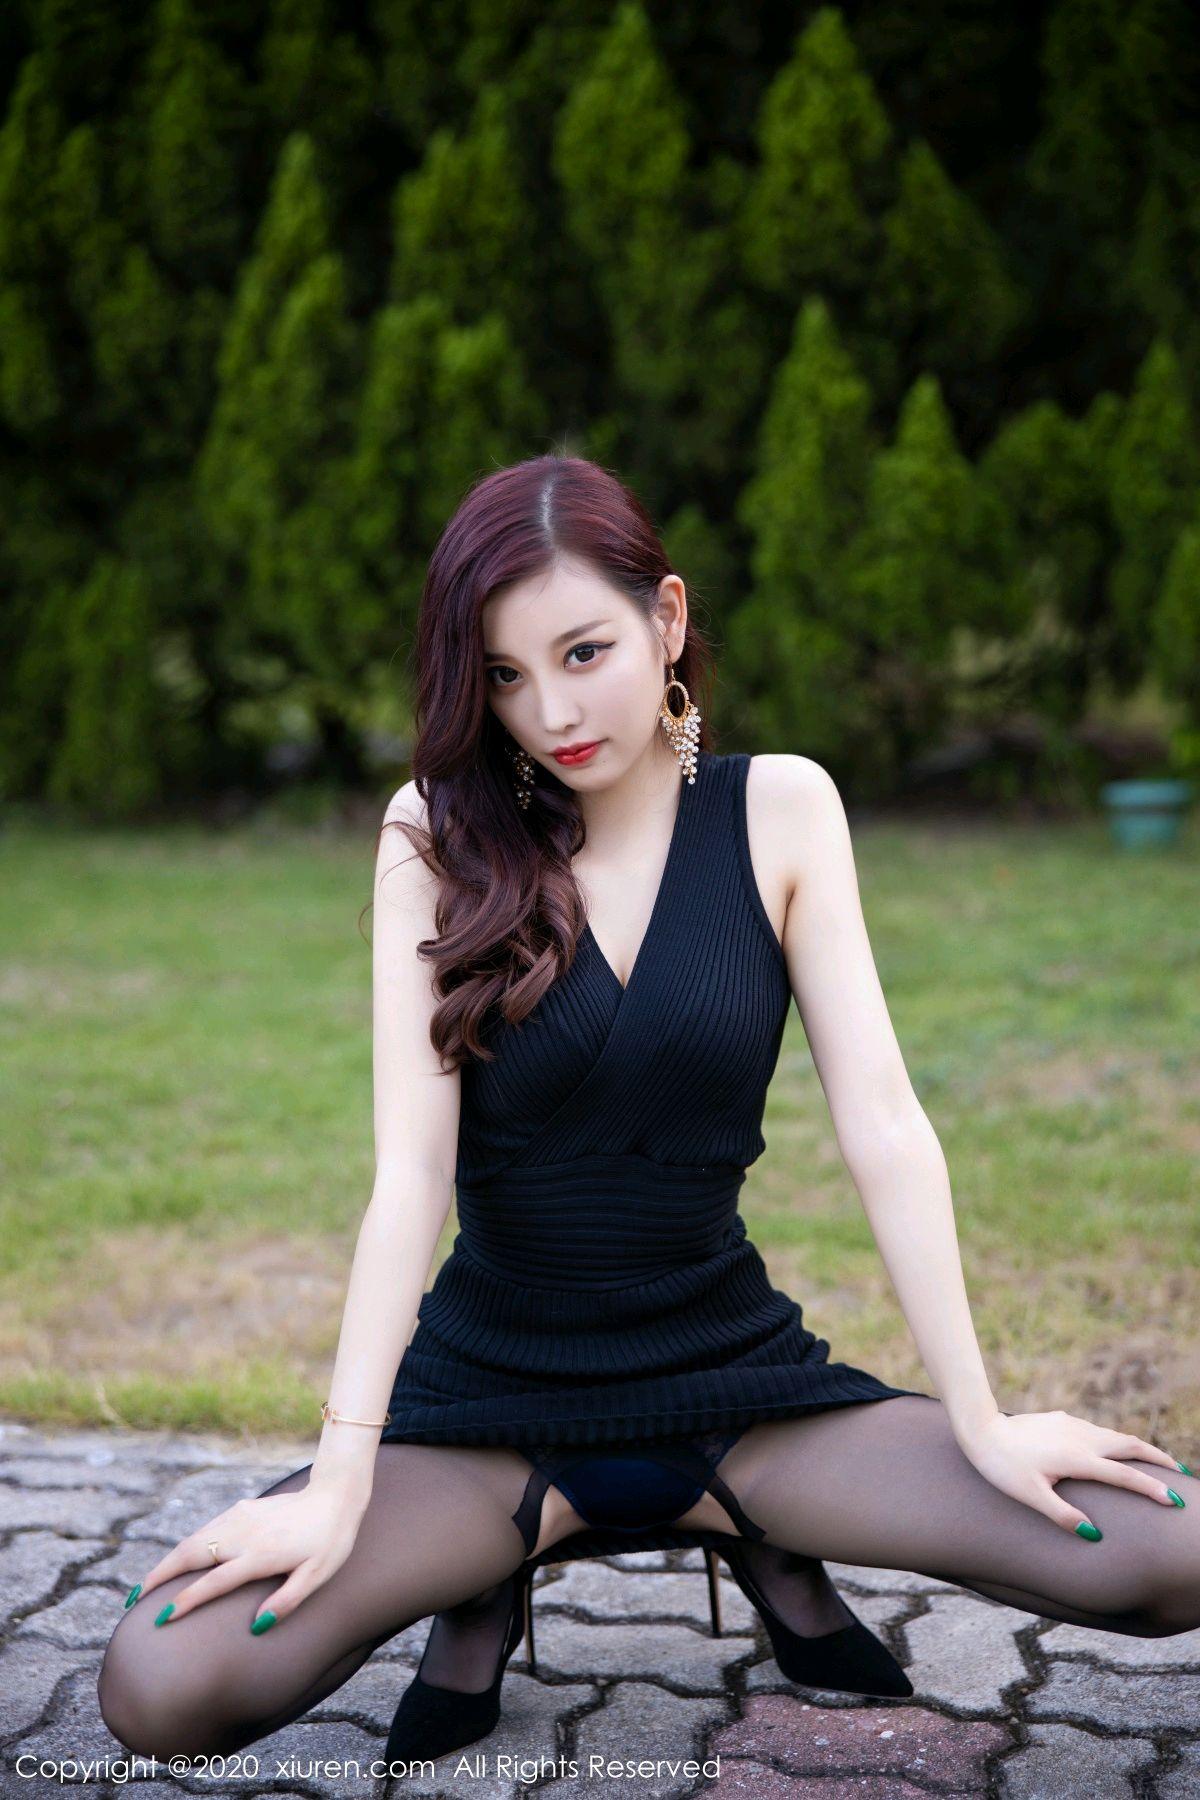 [XiuRen] Vol.2648 Yang Chen Chen 13P, Black Silk, Outdoor, Xiuren, Yang Chen Chen